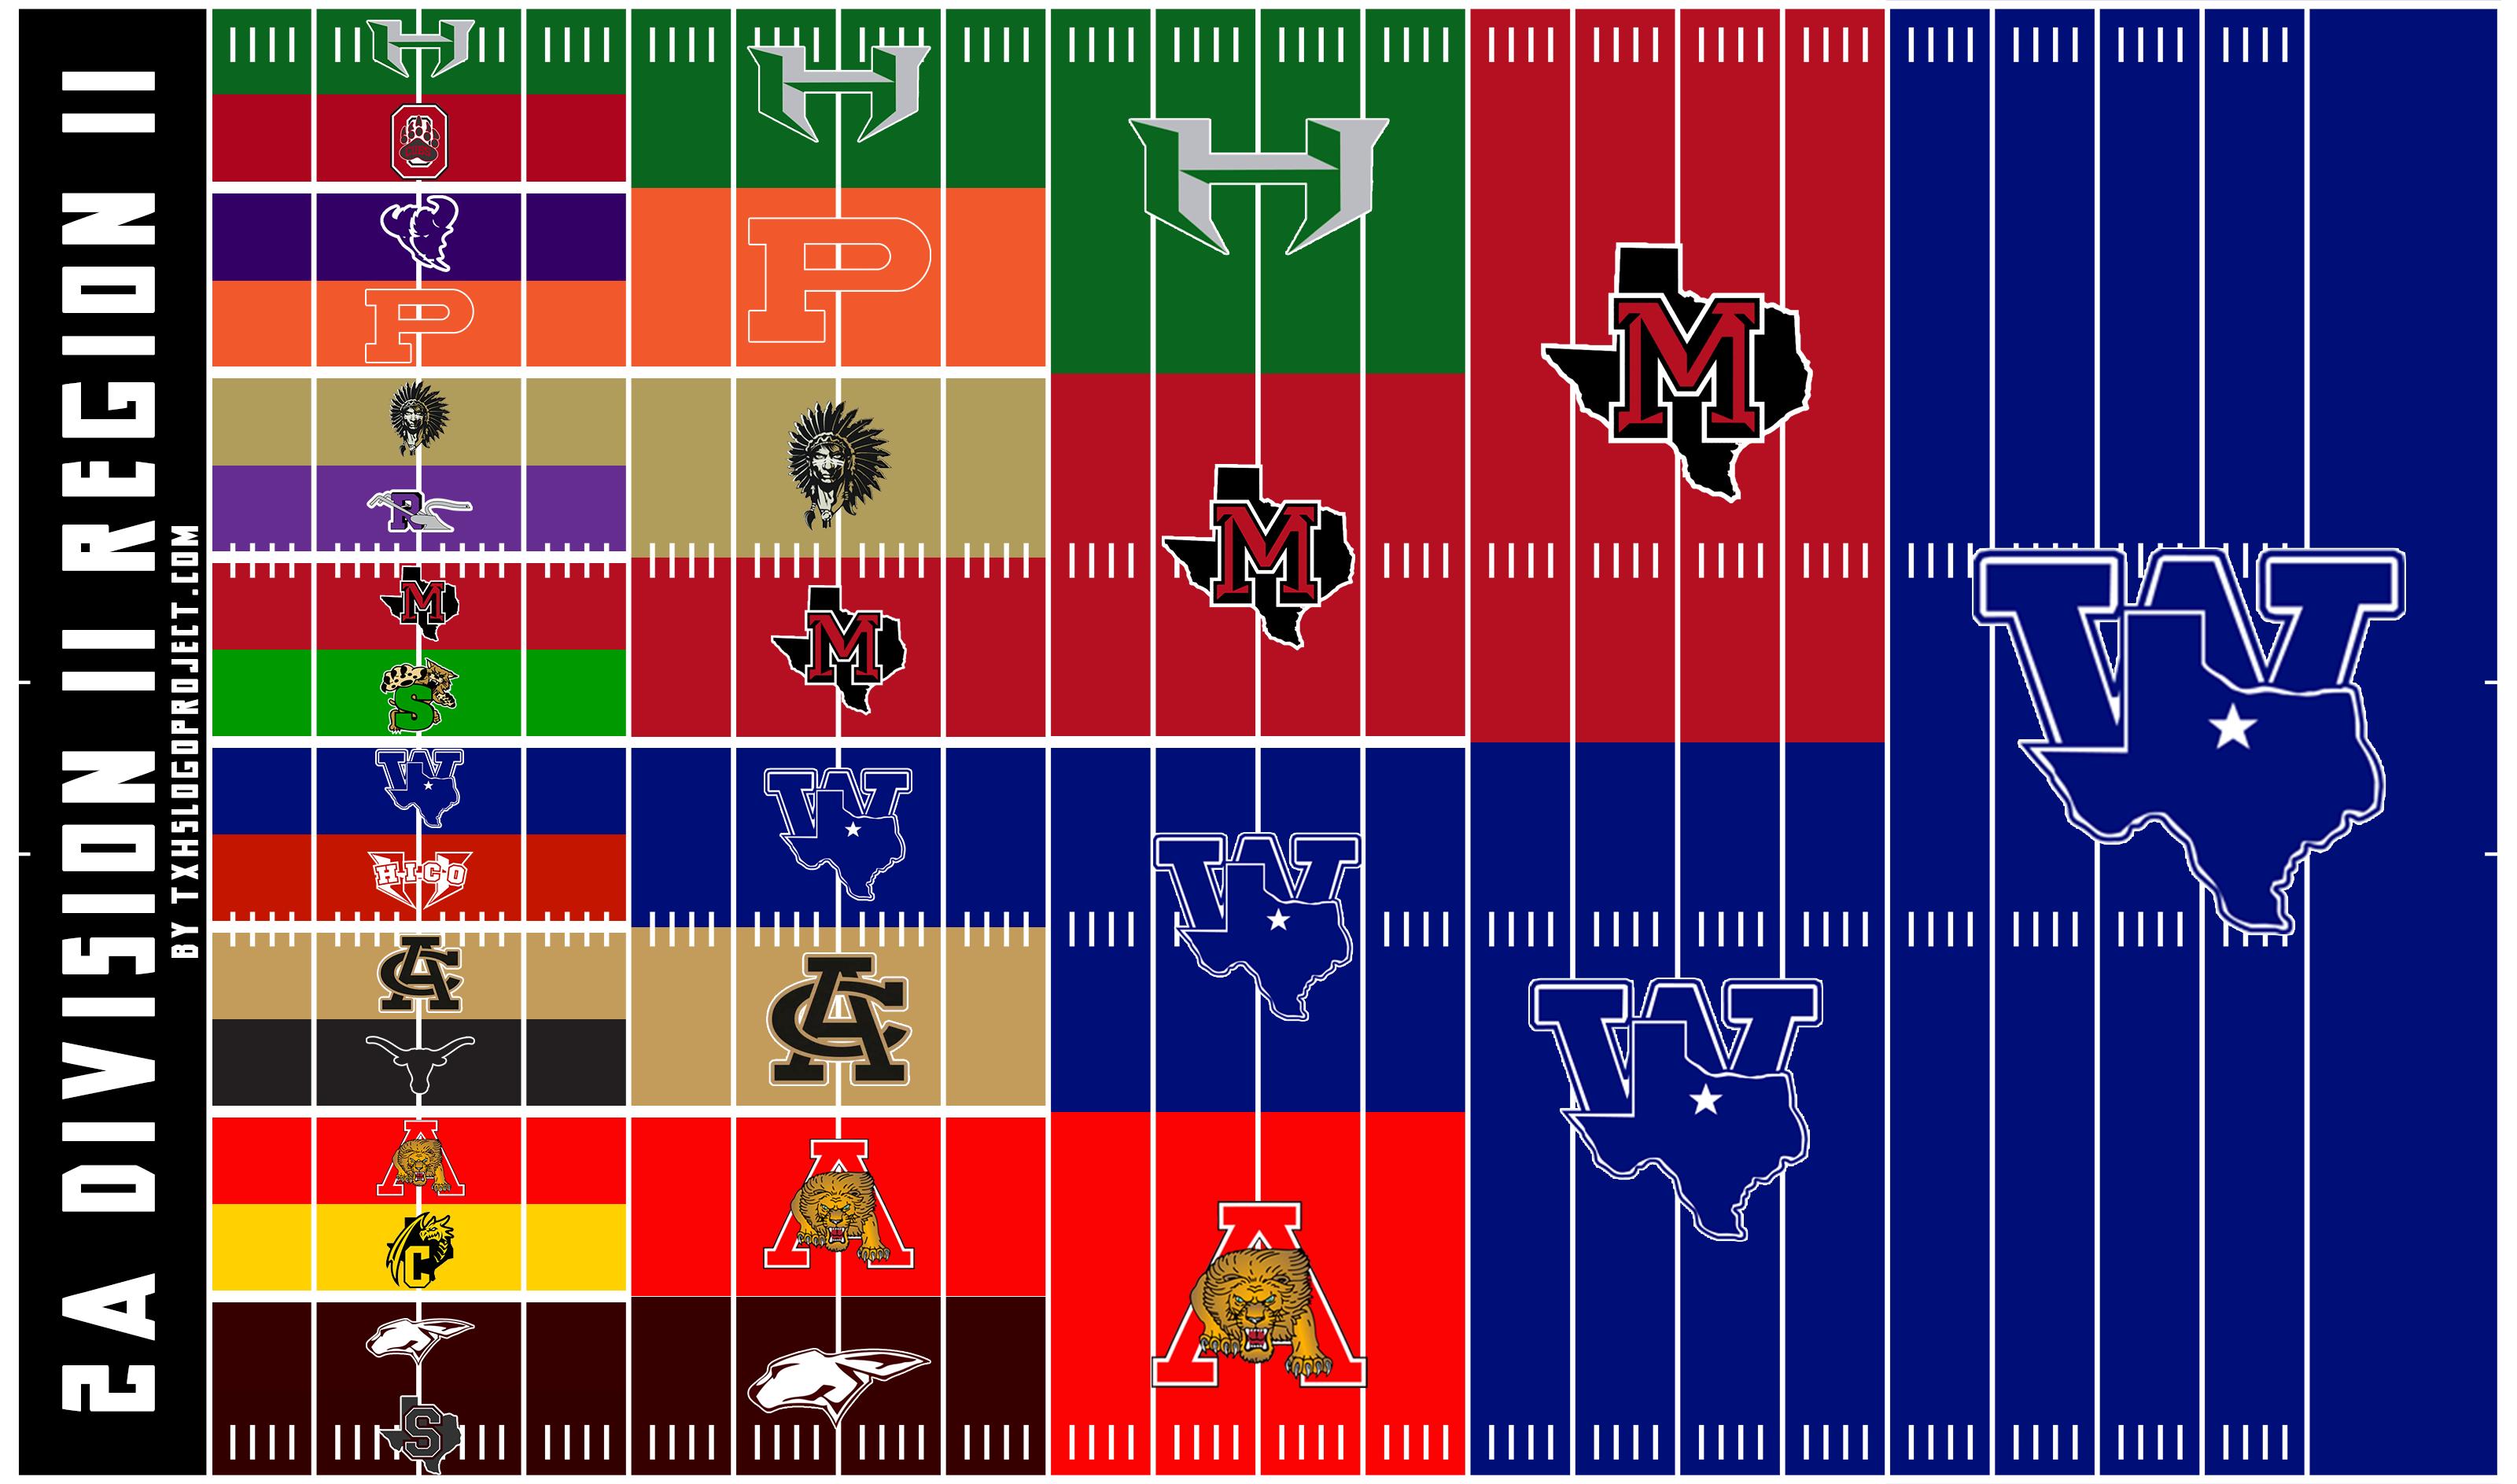 2A Division II Region II